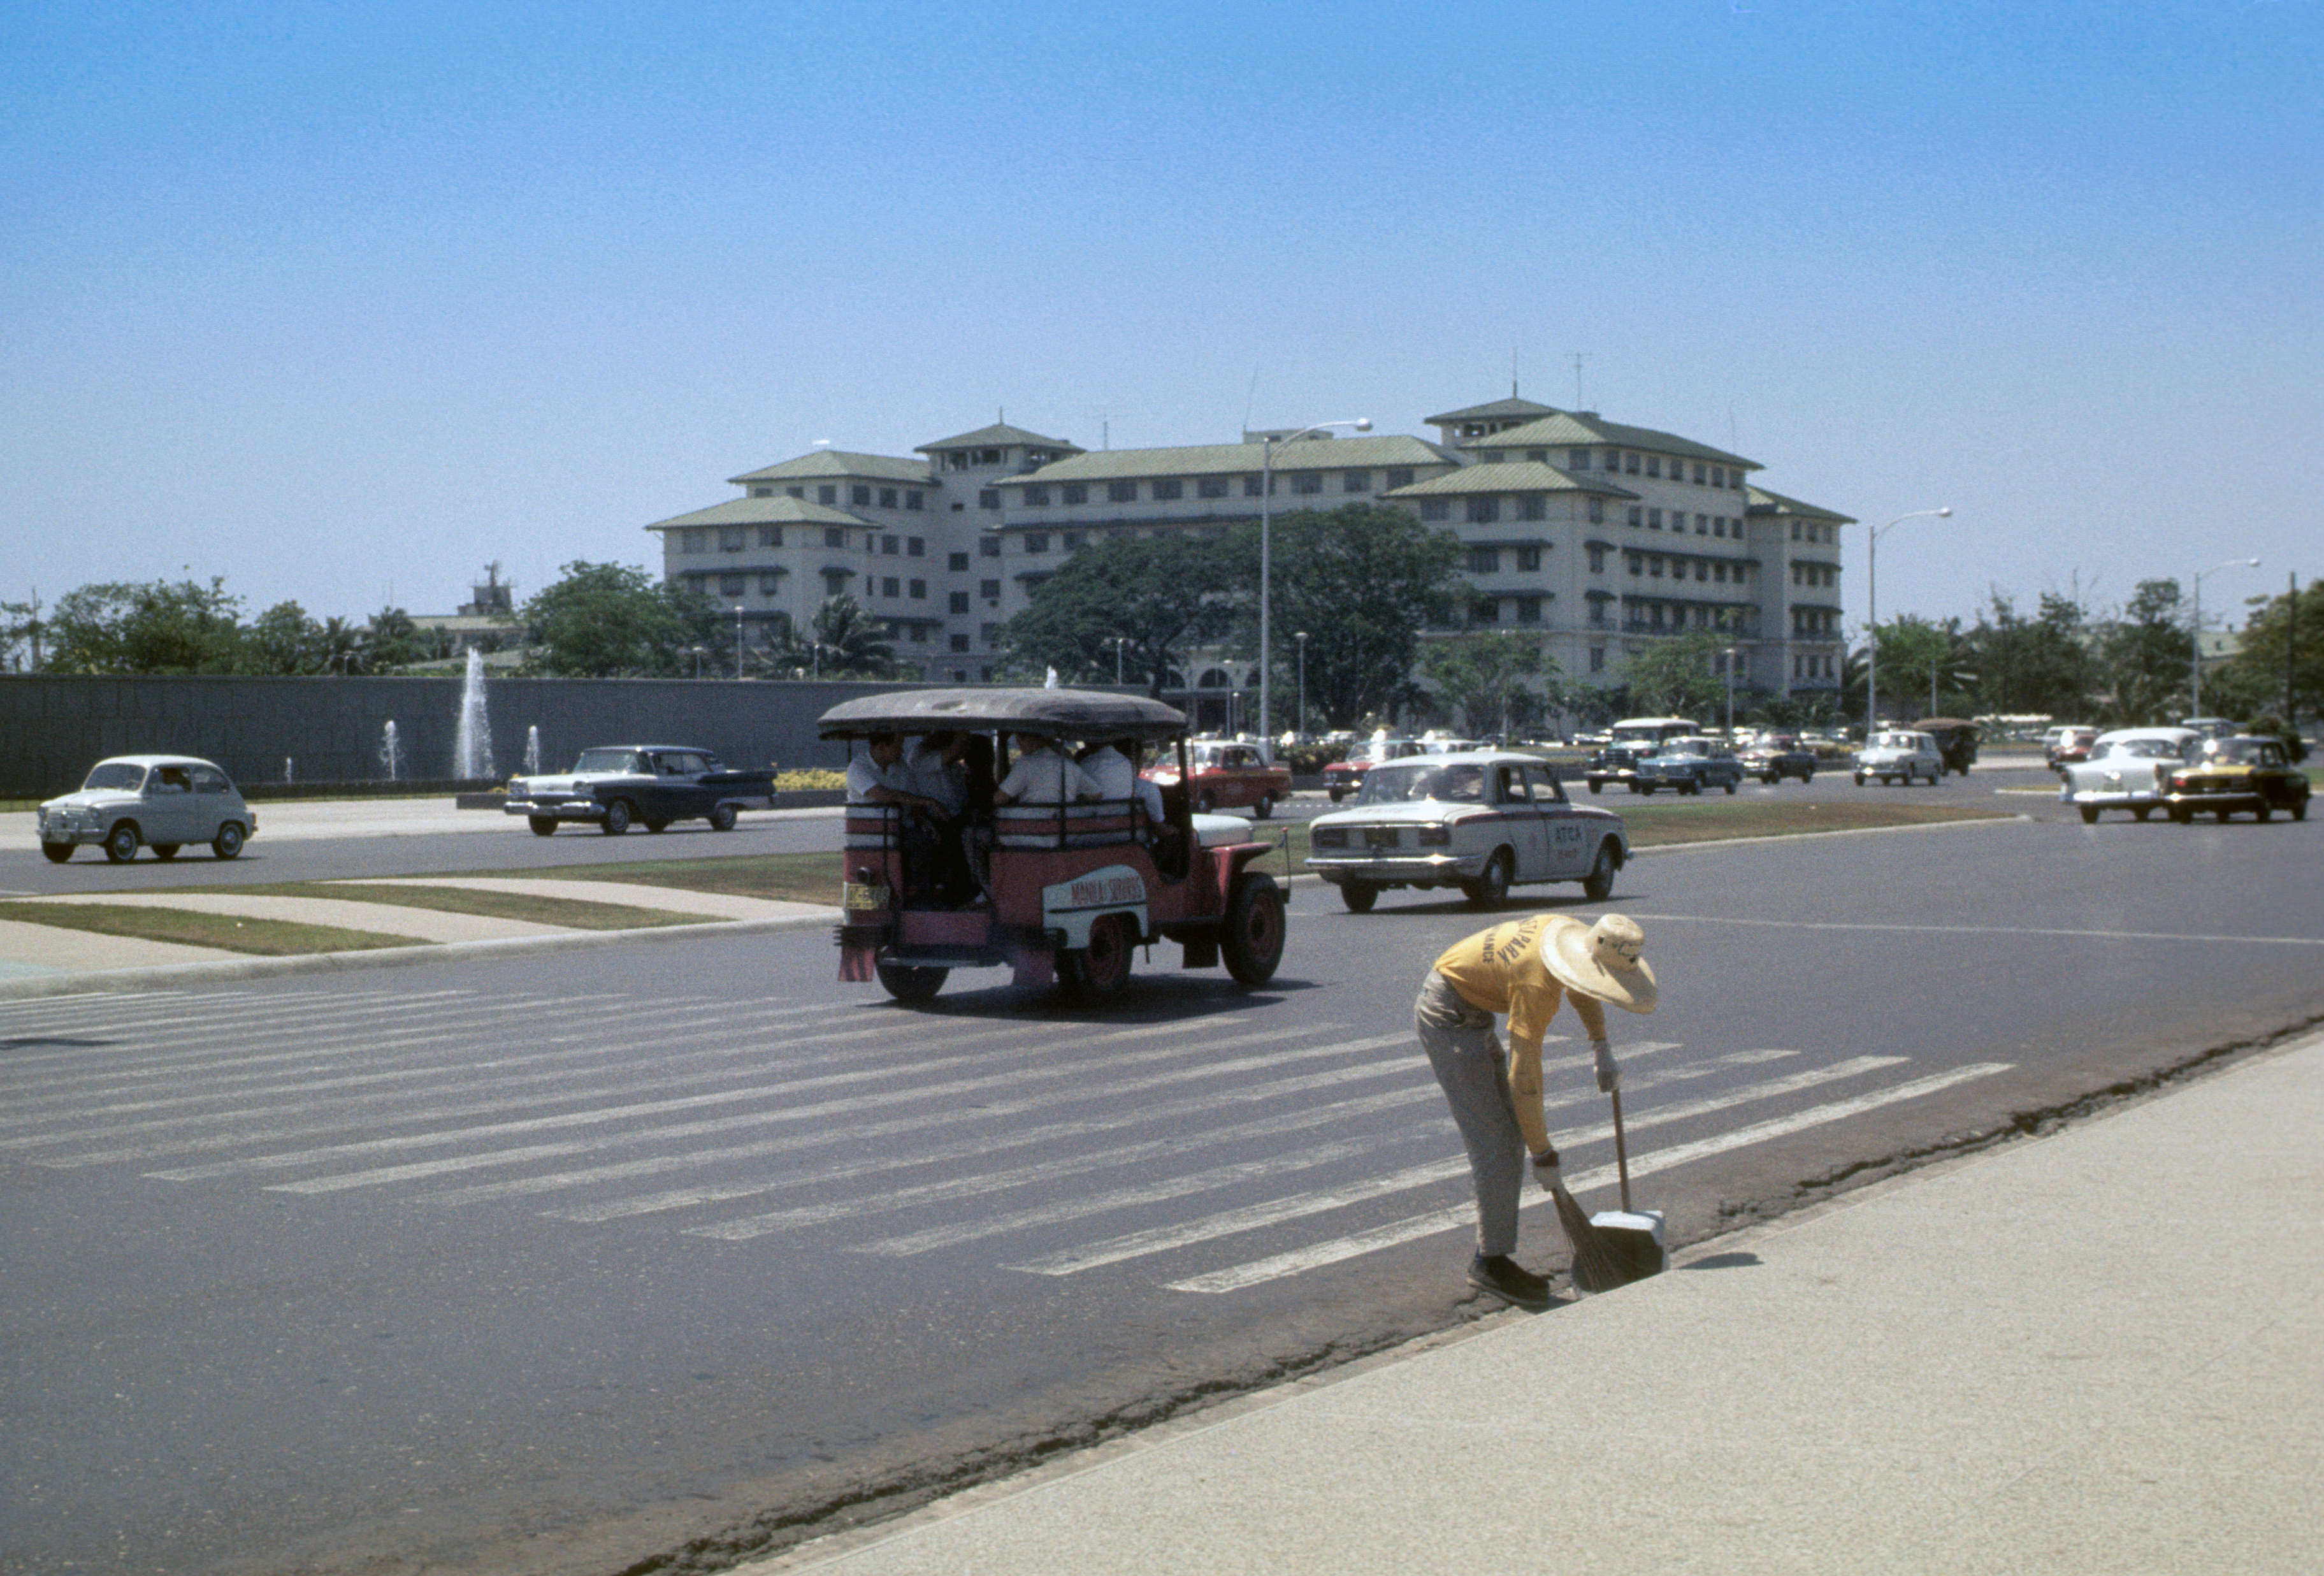 The Manila Hotel -1965.